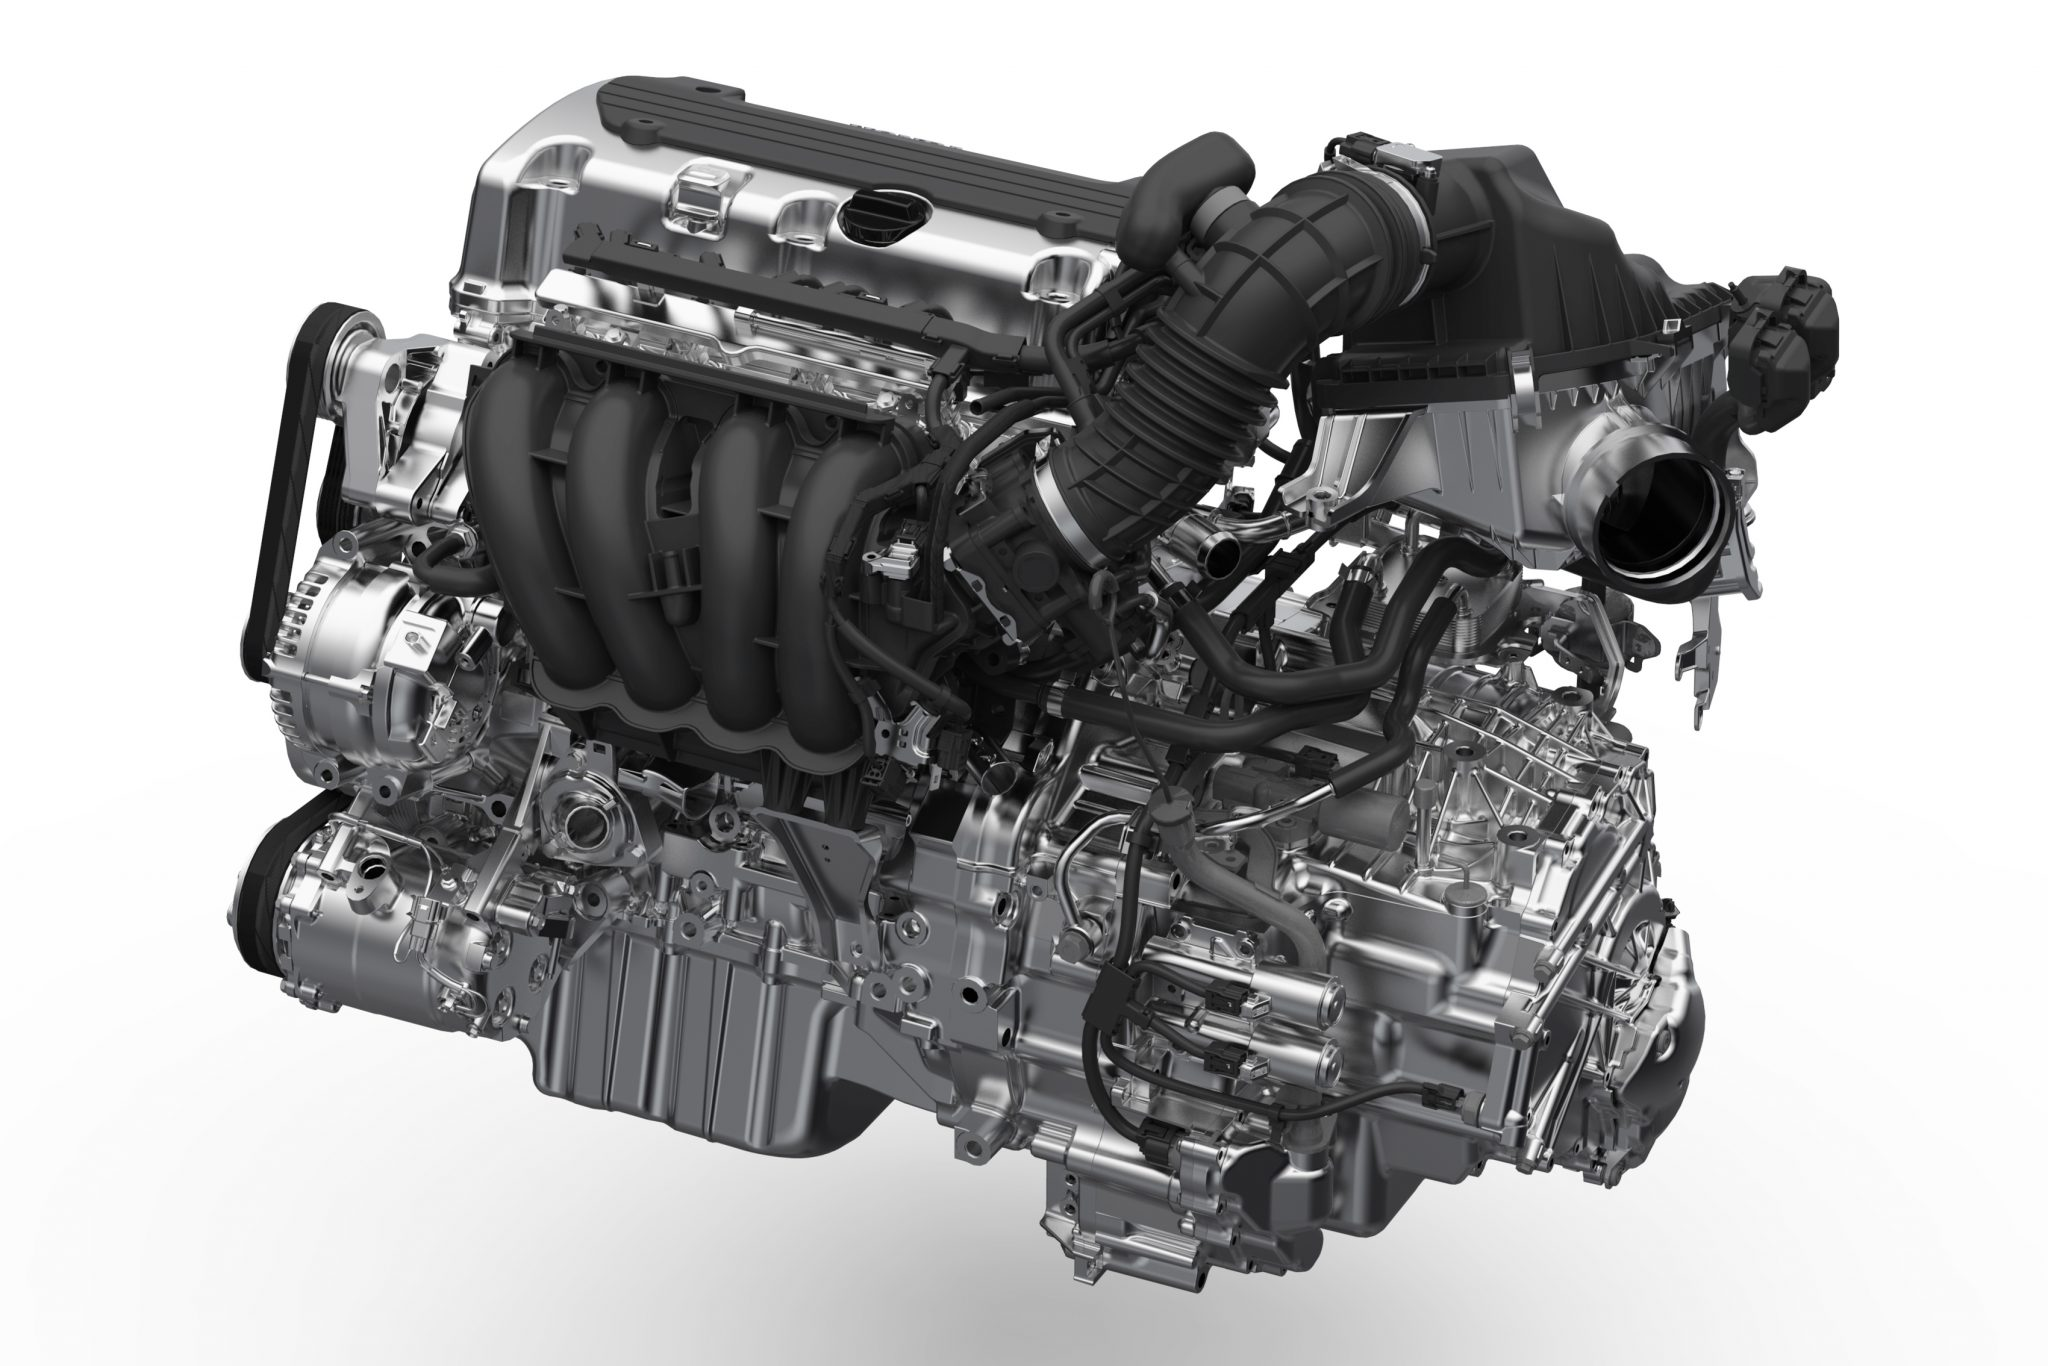 2013 Honda CR-V Technical Illustration